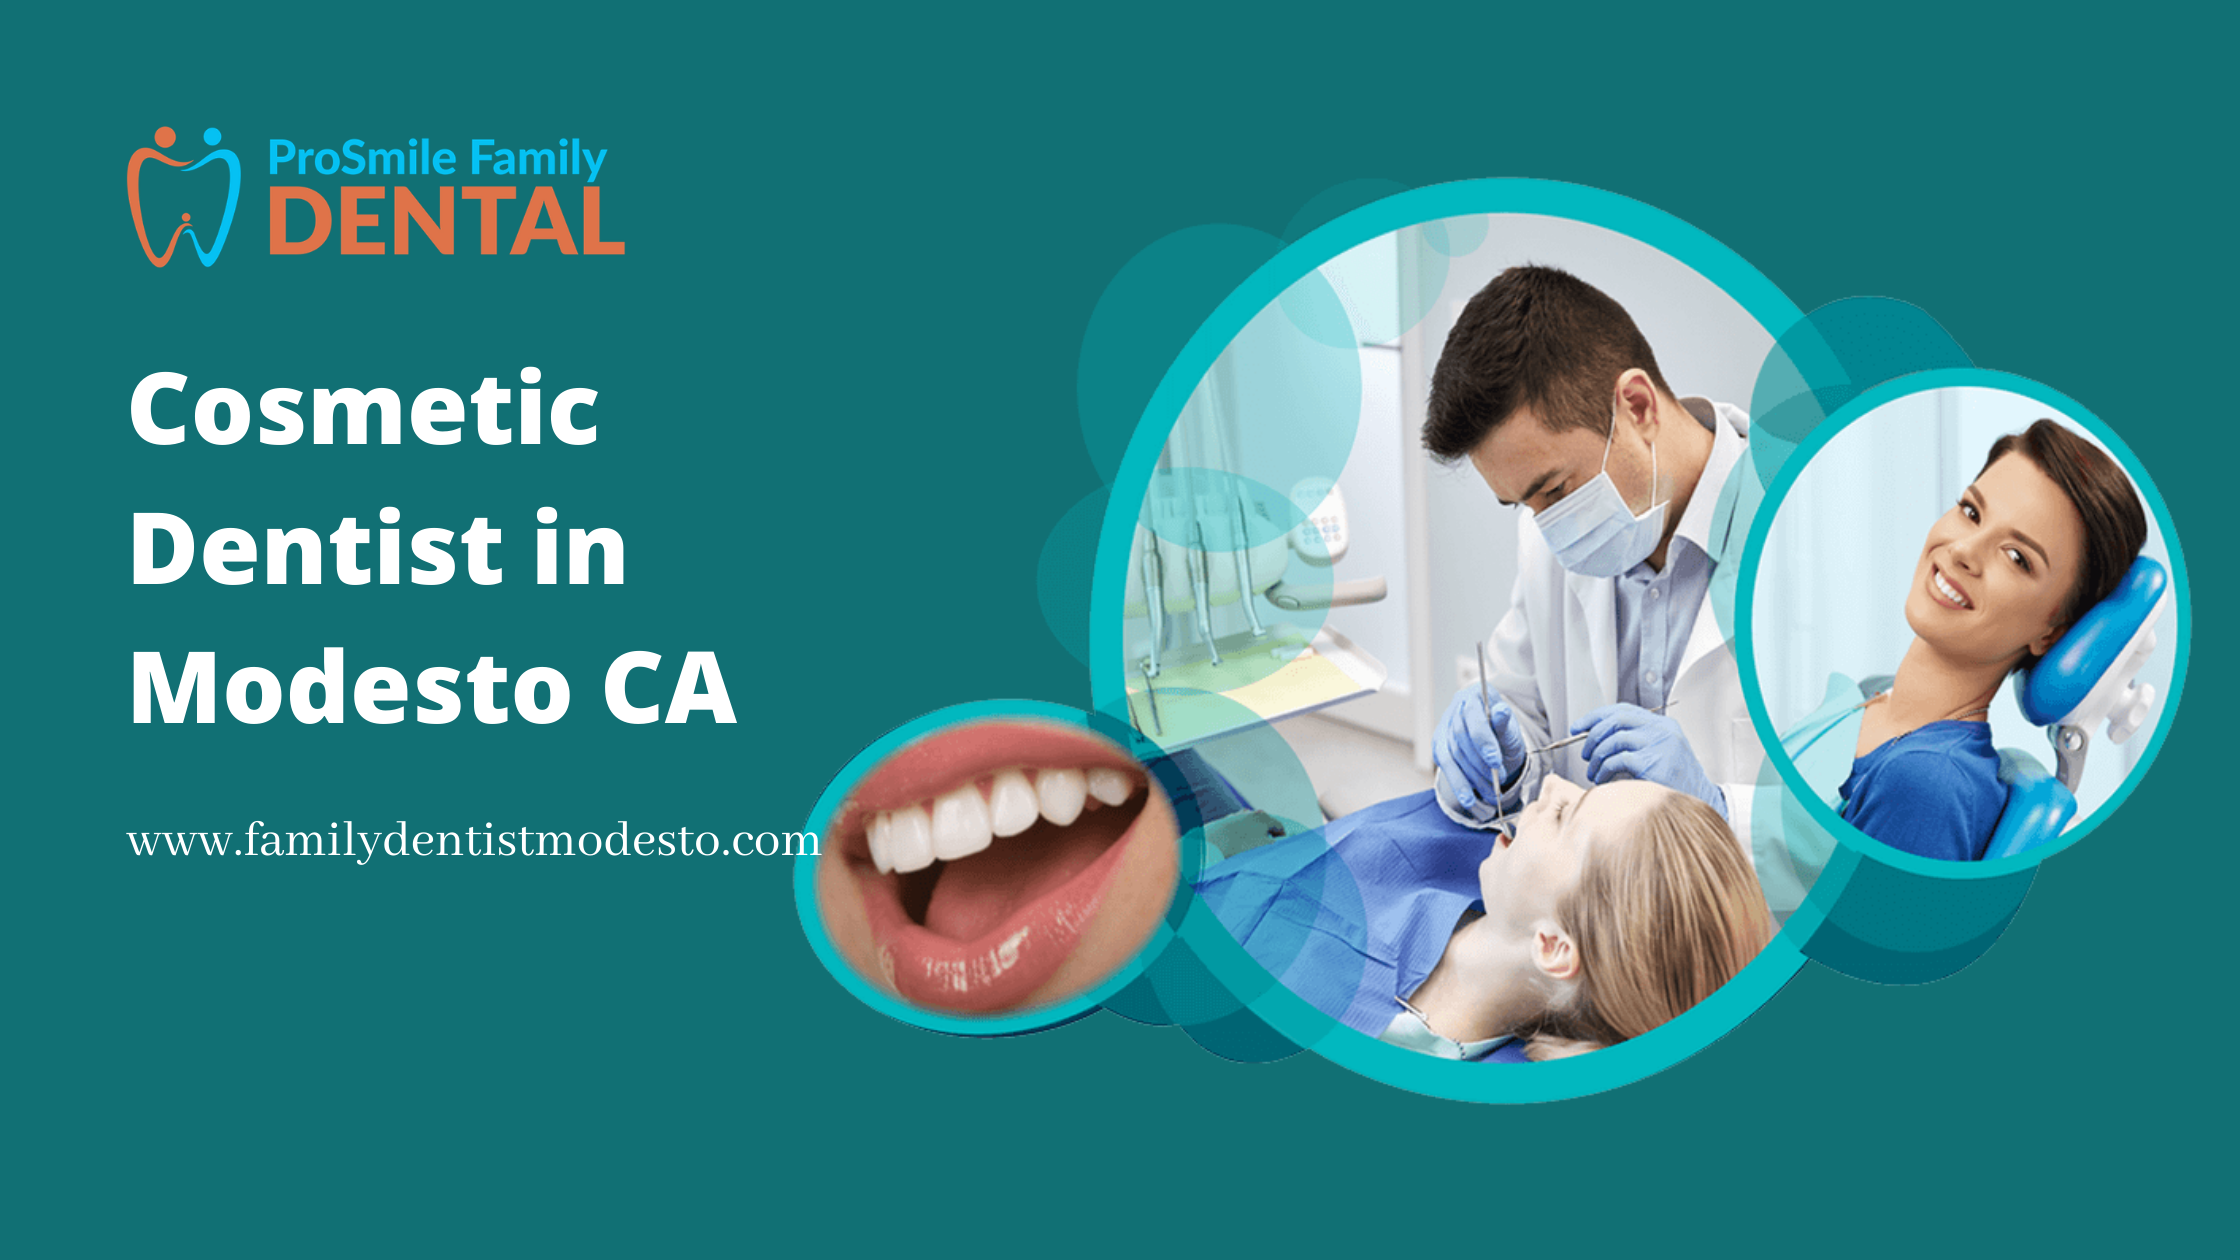 Cosmetic dentist in Modesto CA | Emergency dentist modesto